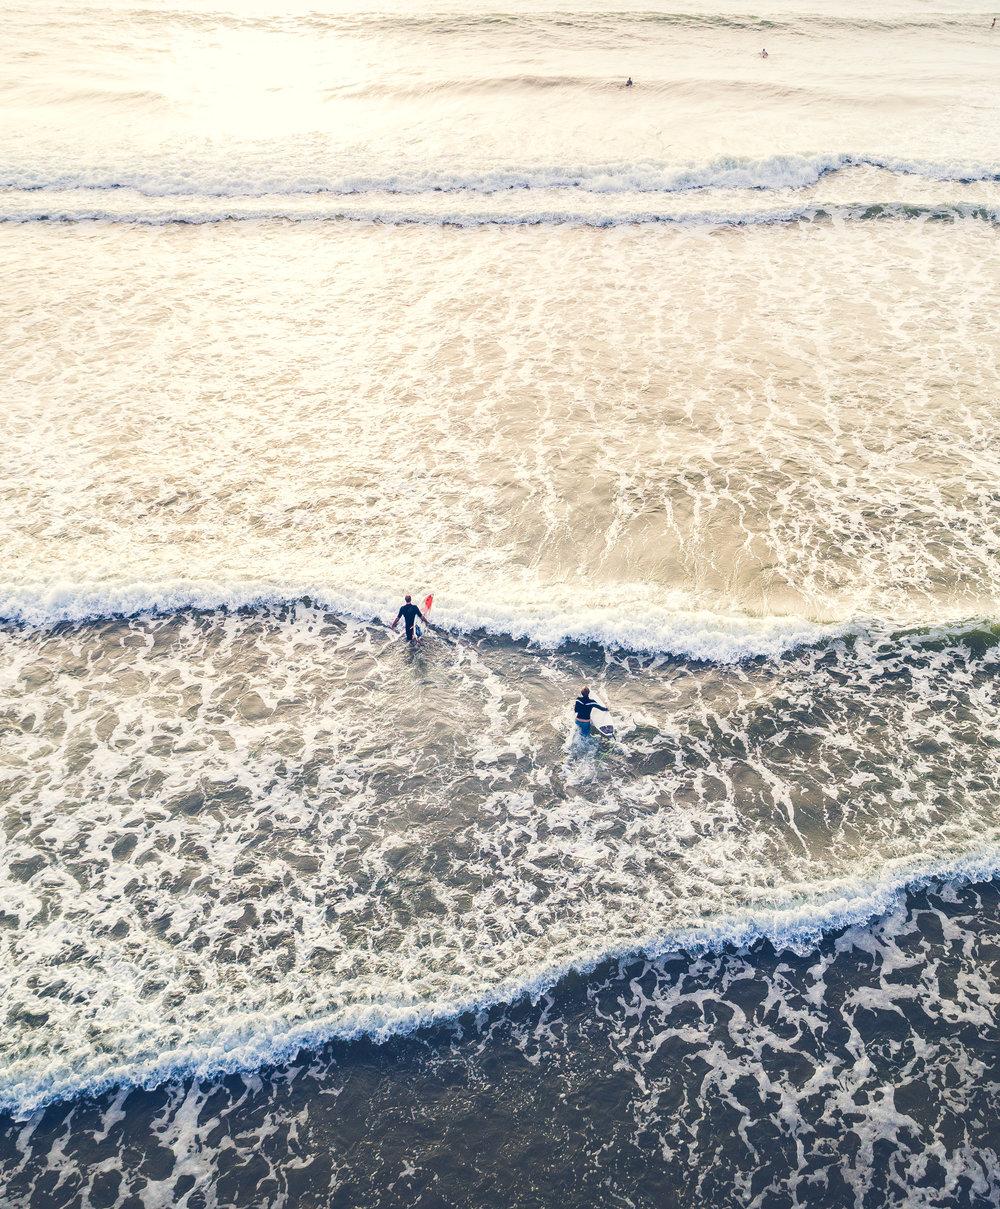 Coolum Surfers